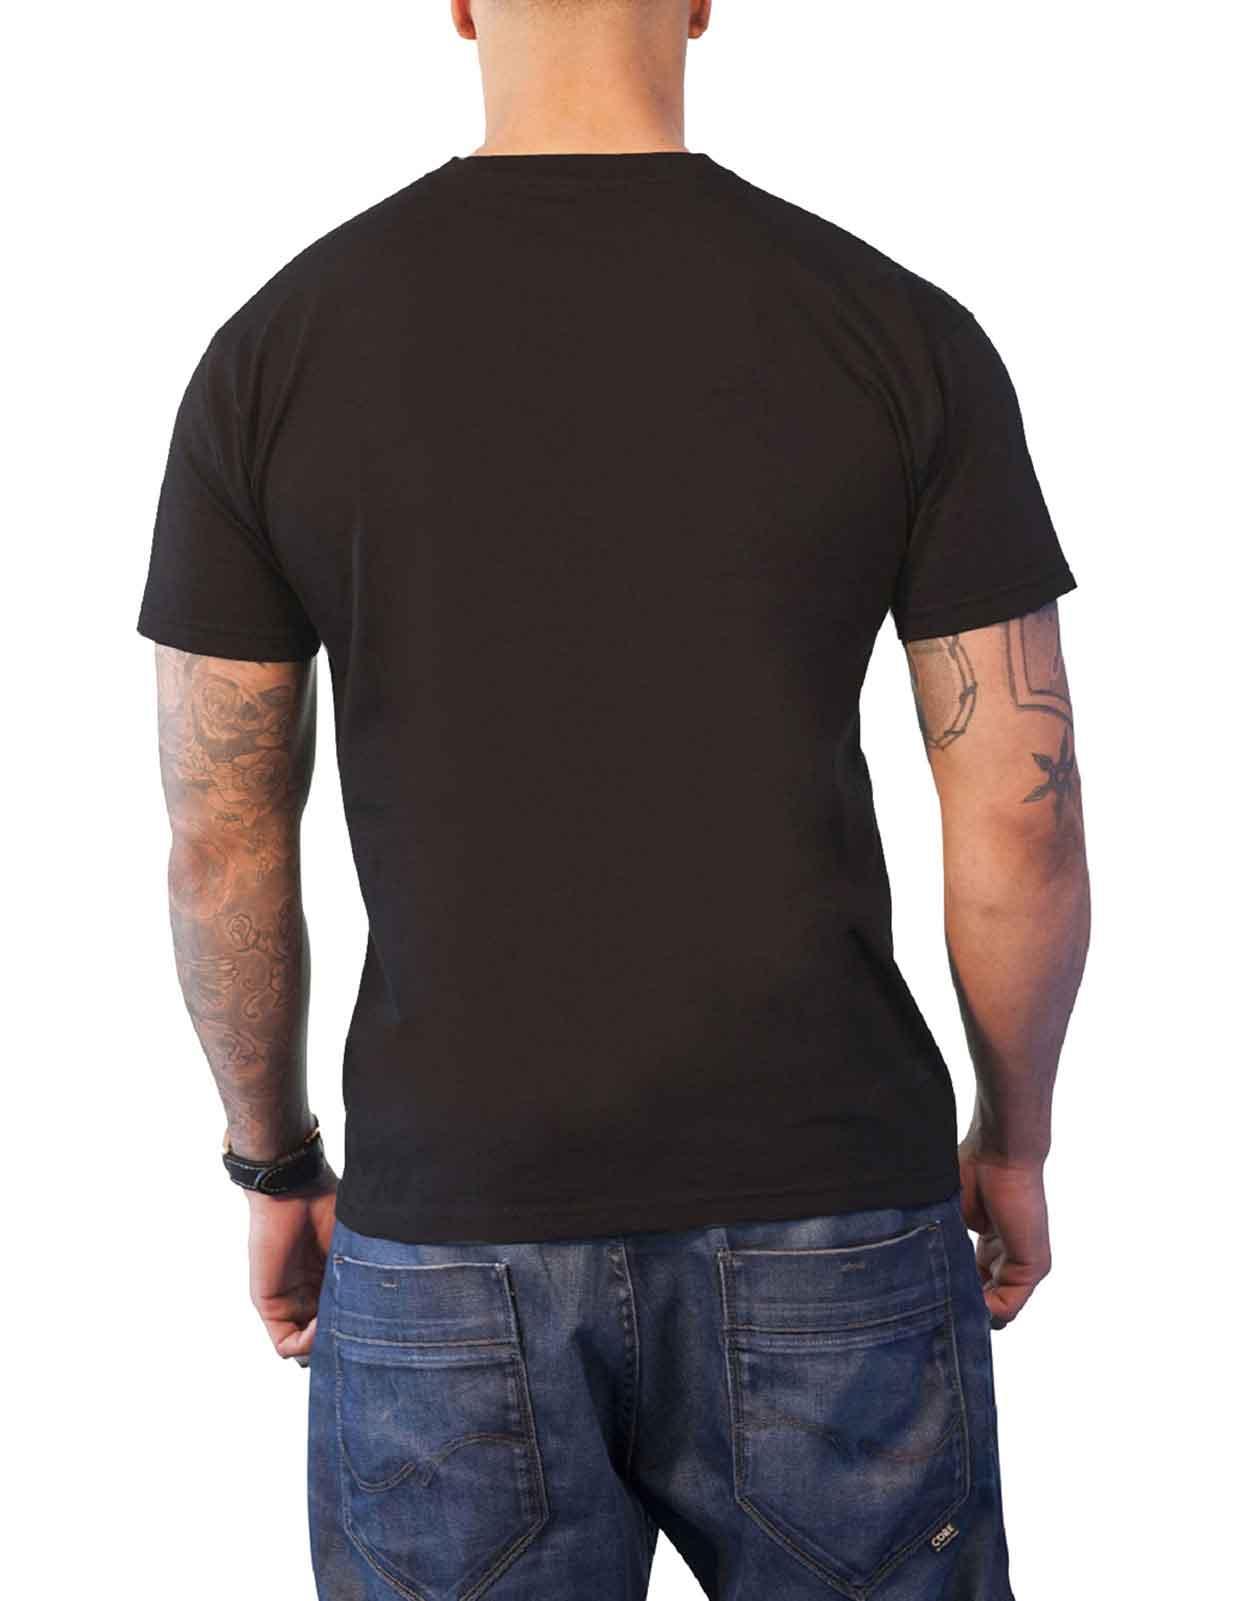 Officiel-Metallica-T-shirt-filaire-justice-for-all-RTL-Band-Logo-Homme-Nouveau miniature 37